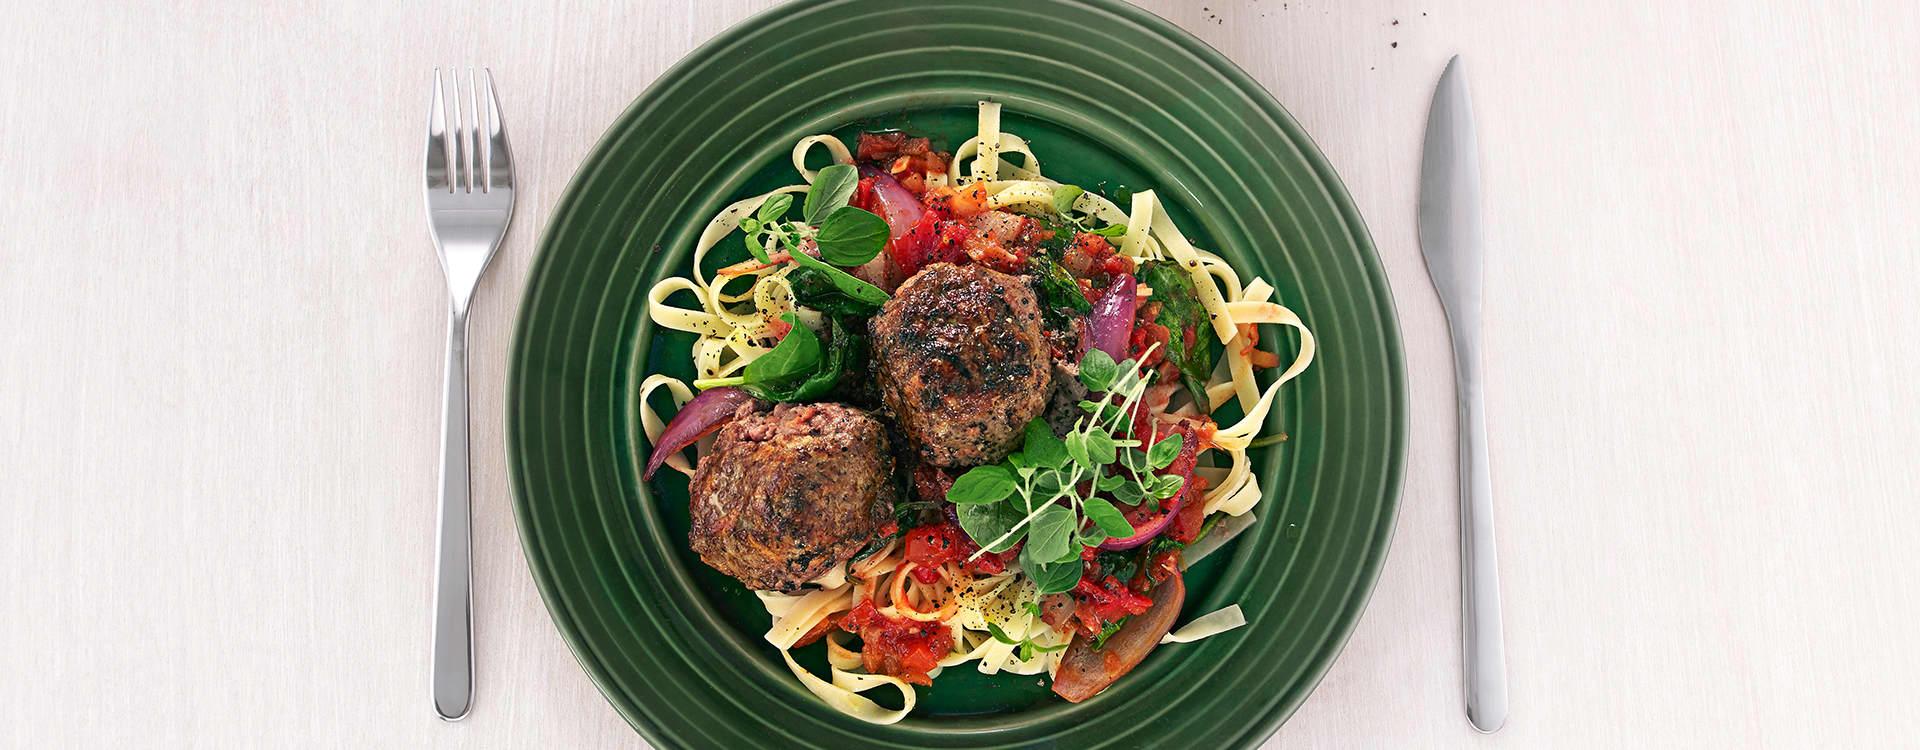 Fetaostfylte karbonader med tomatsaus og tagliatelle